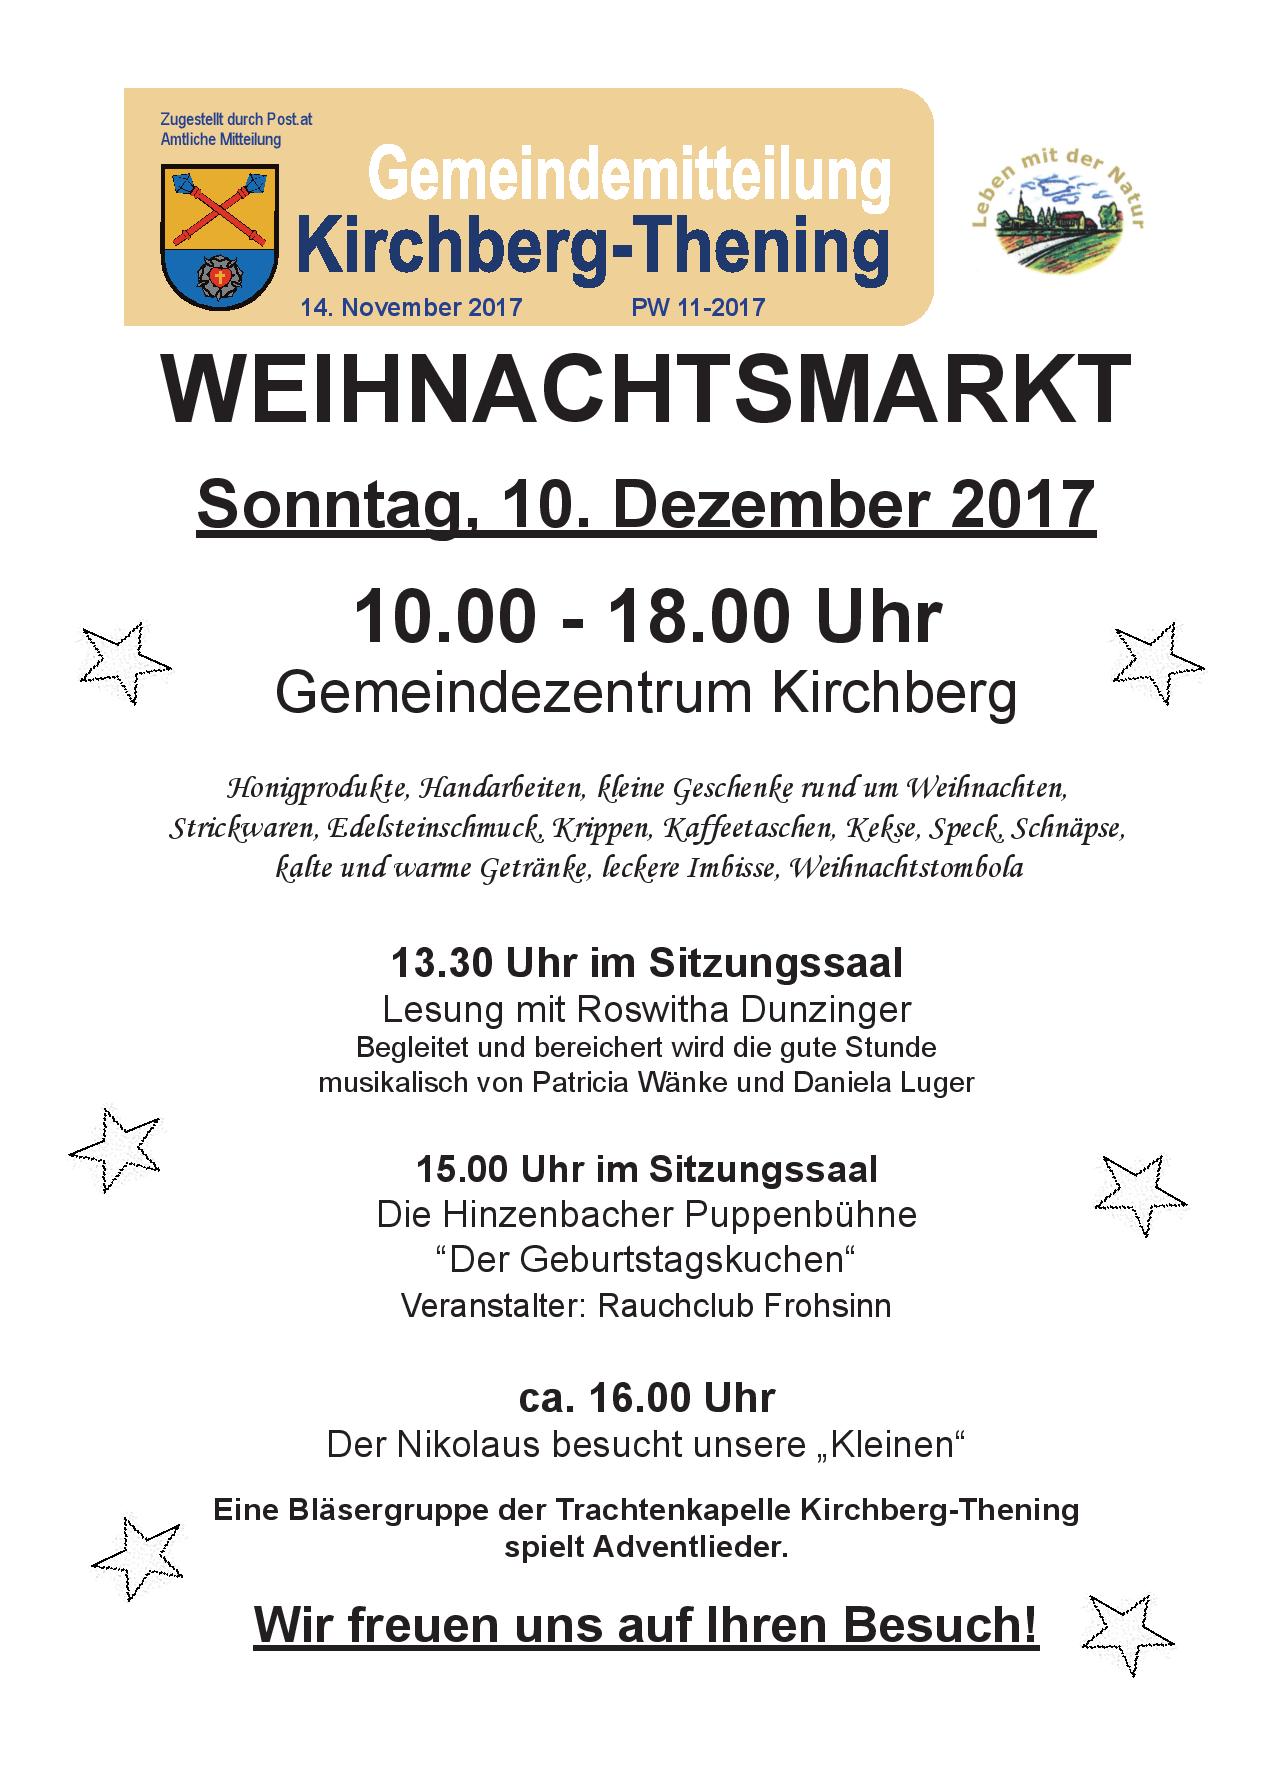 PW 11/2017 - Kirchberg-Thening - Startseite